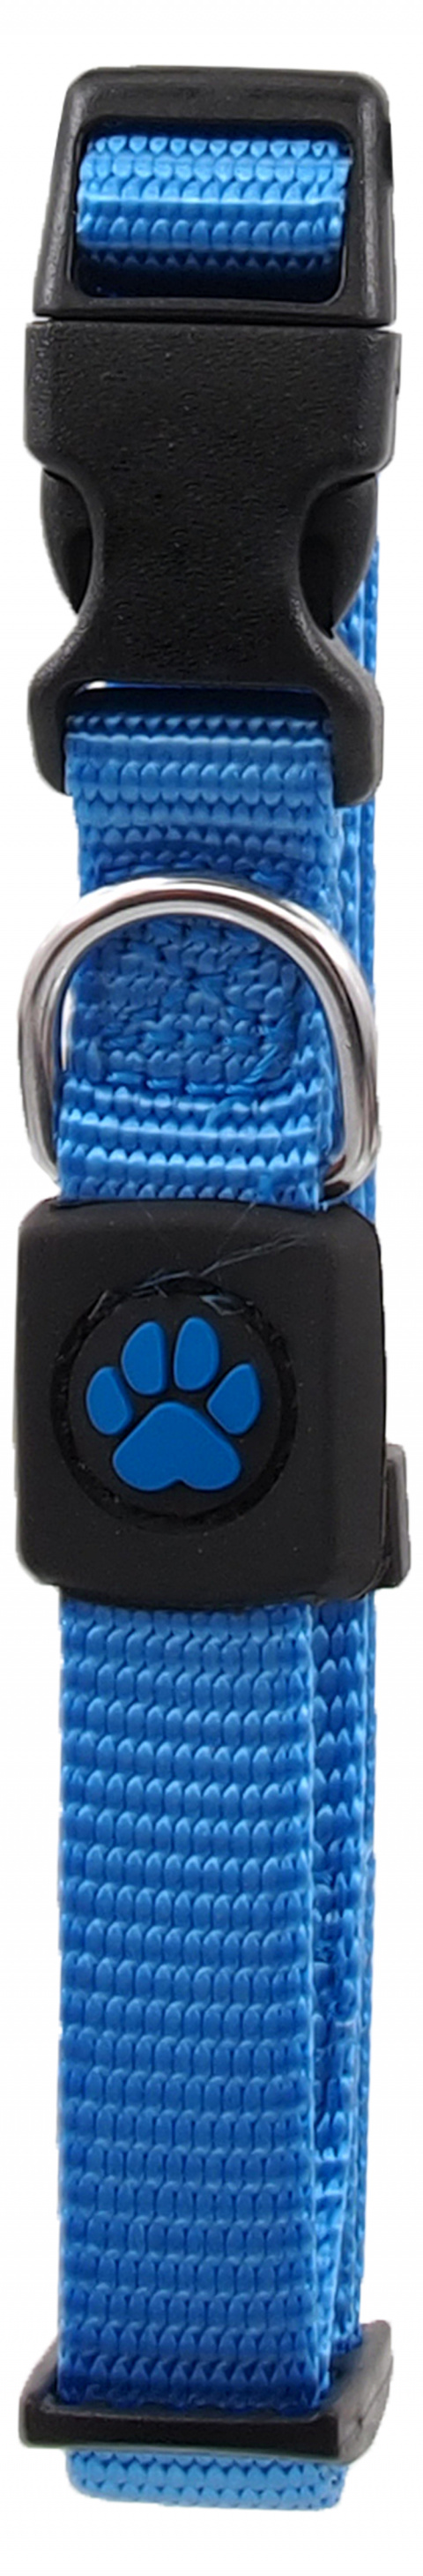 Obojek Active Dog Premium S modrý 1,5x27-37cm title=